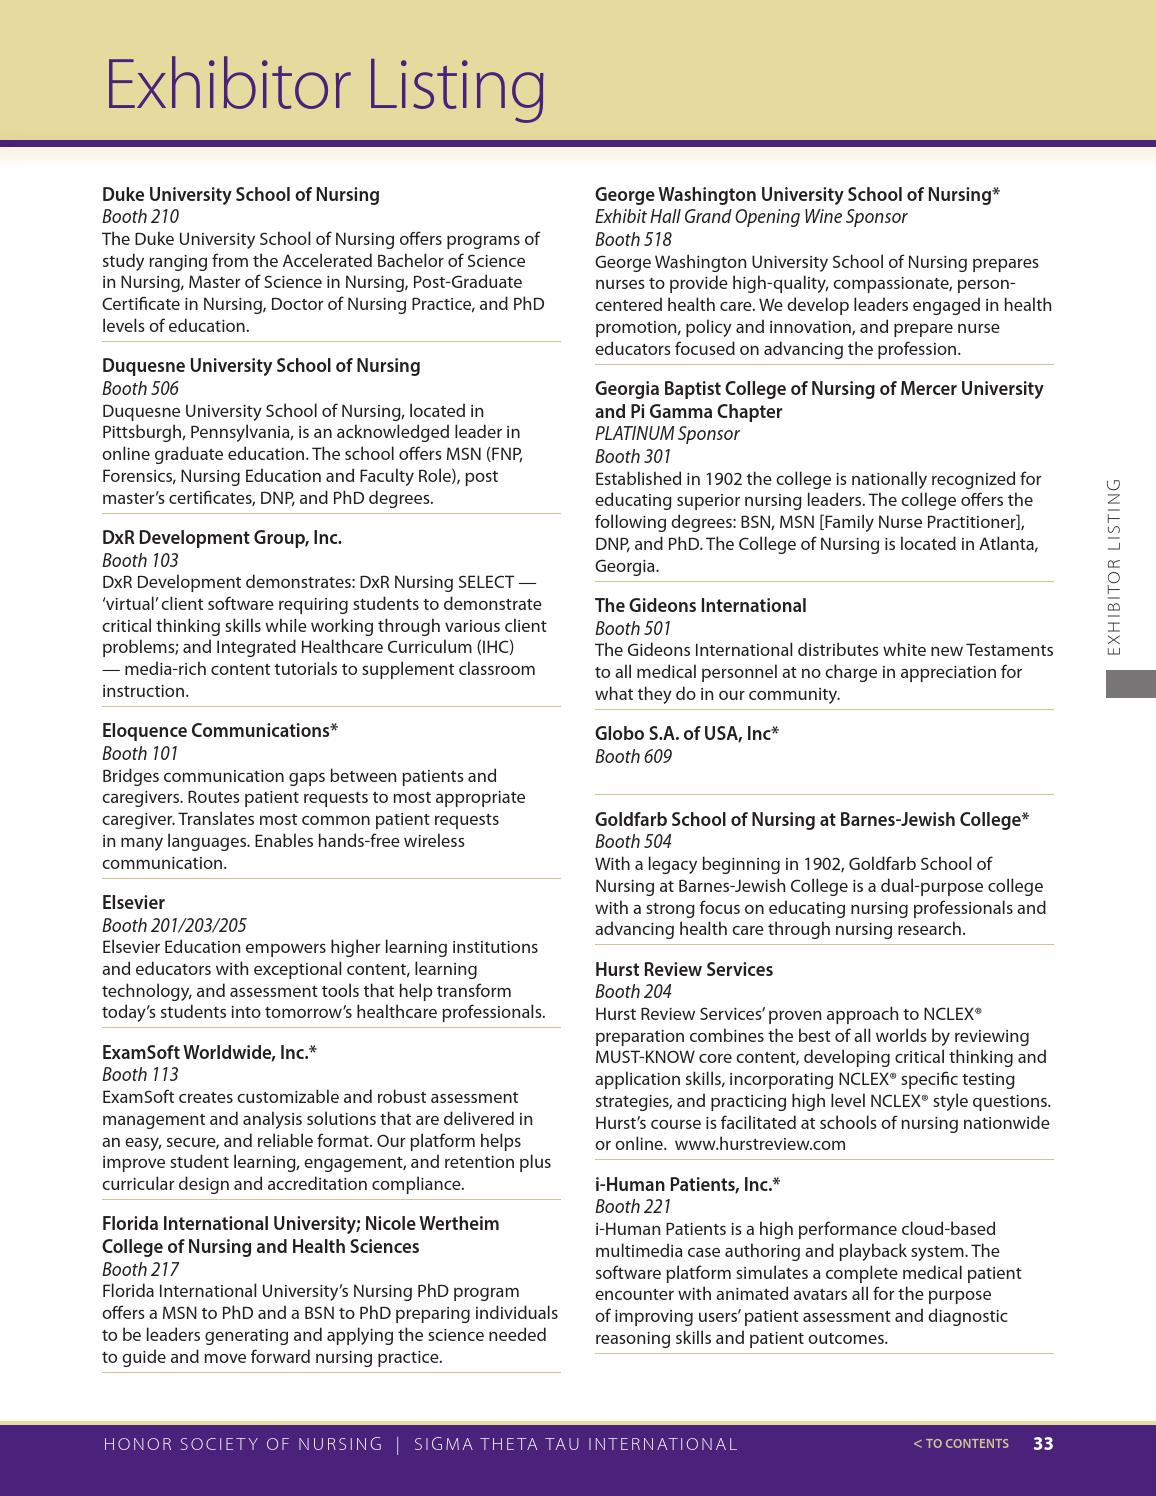 43rd Biennial Convention Program By Sigma Theta Tau International